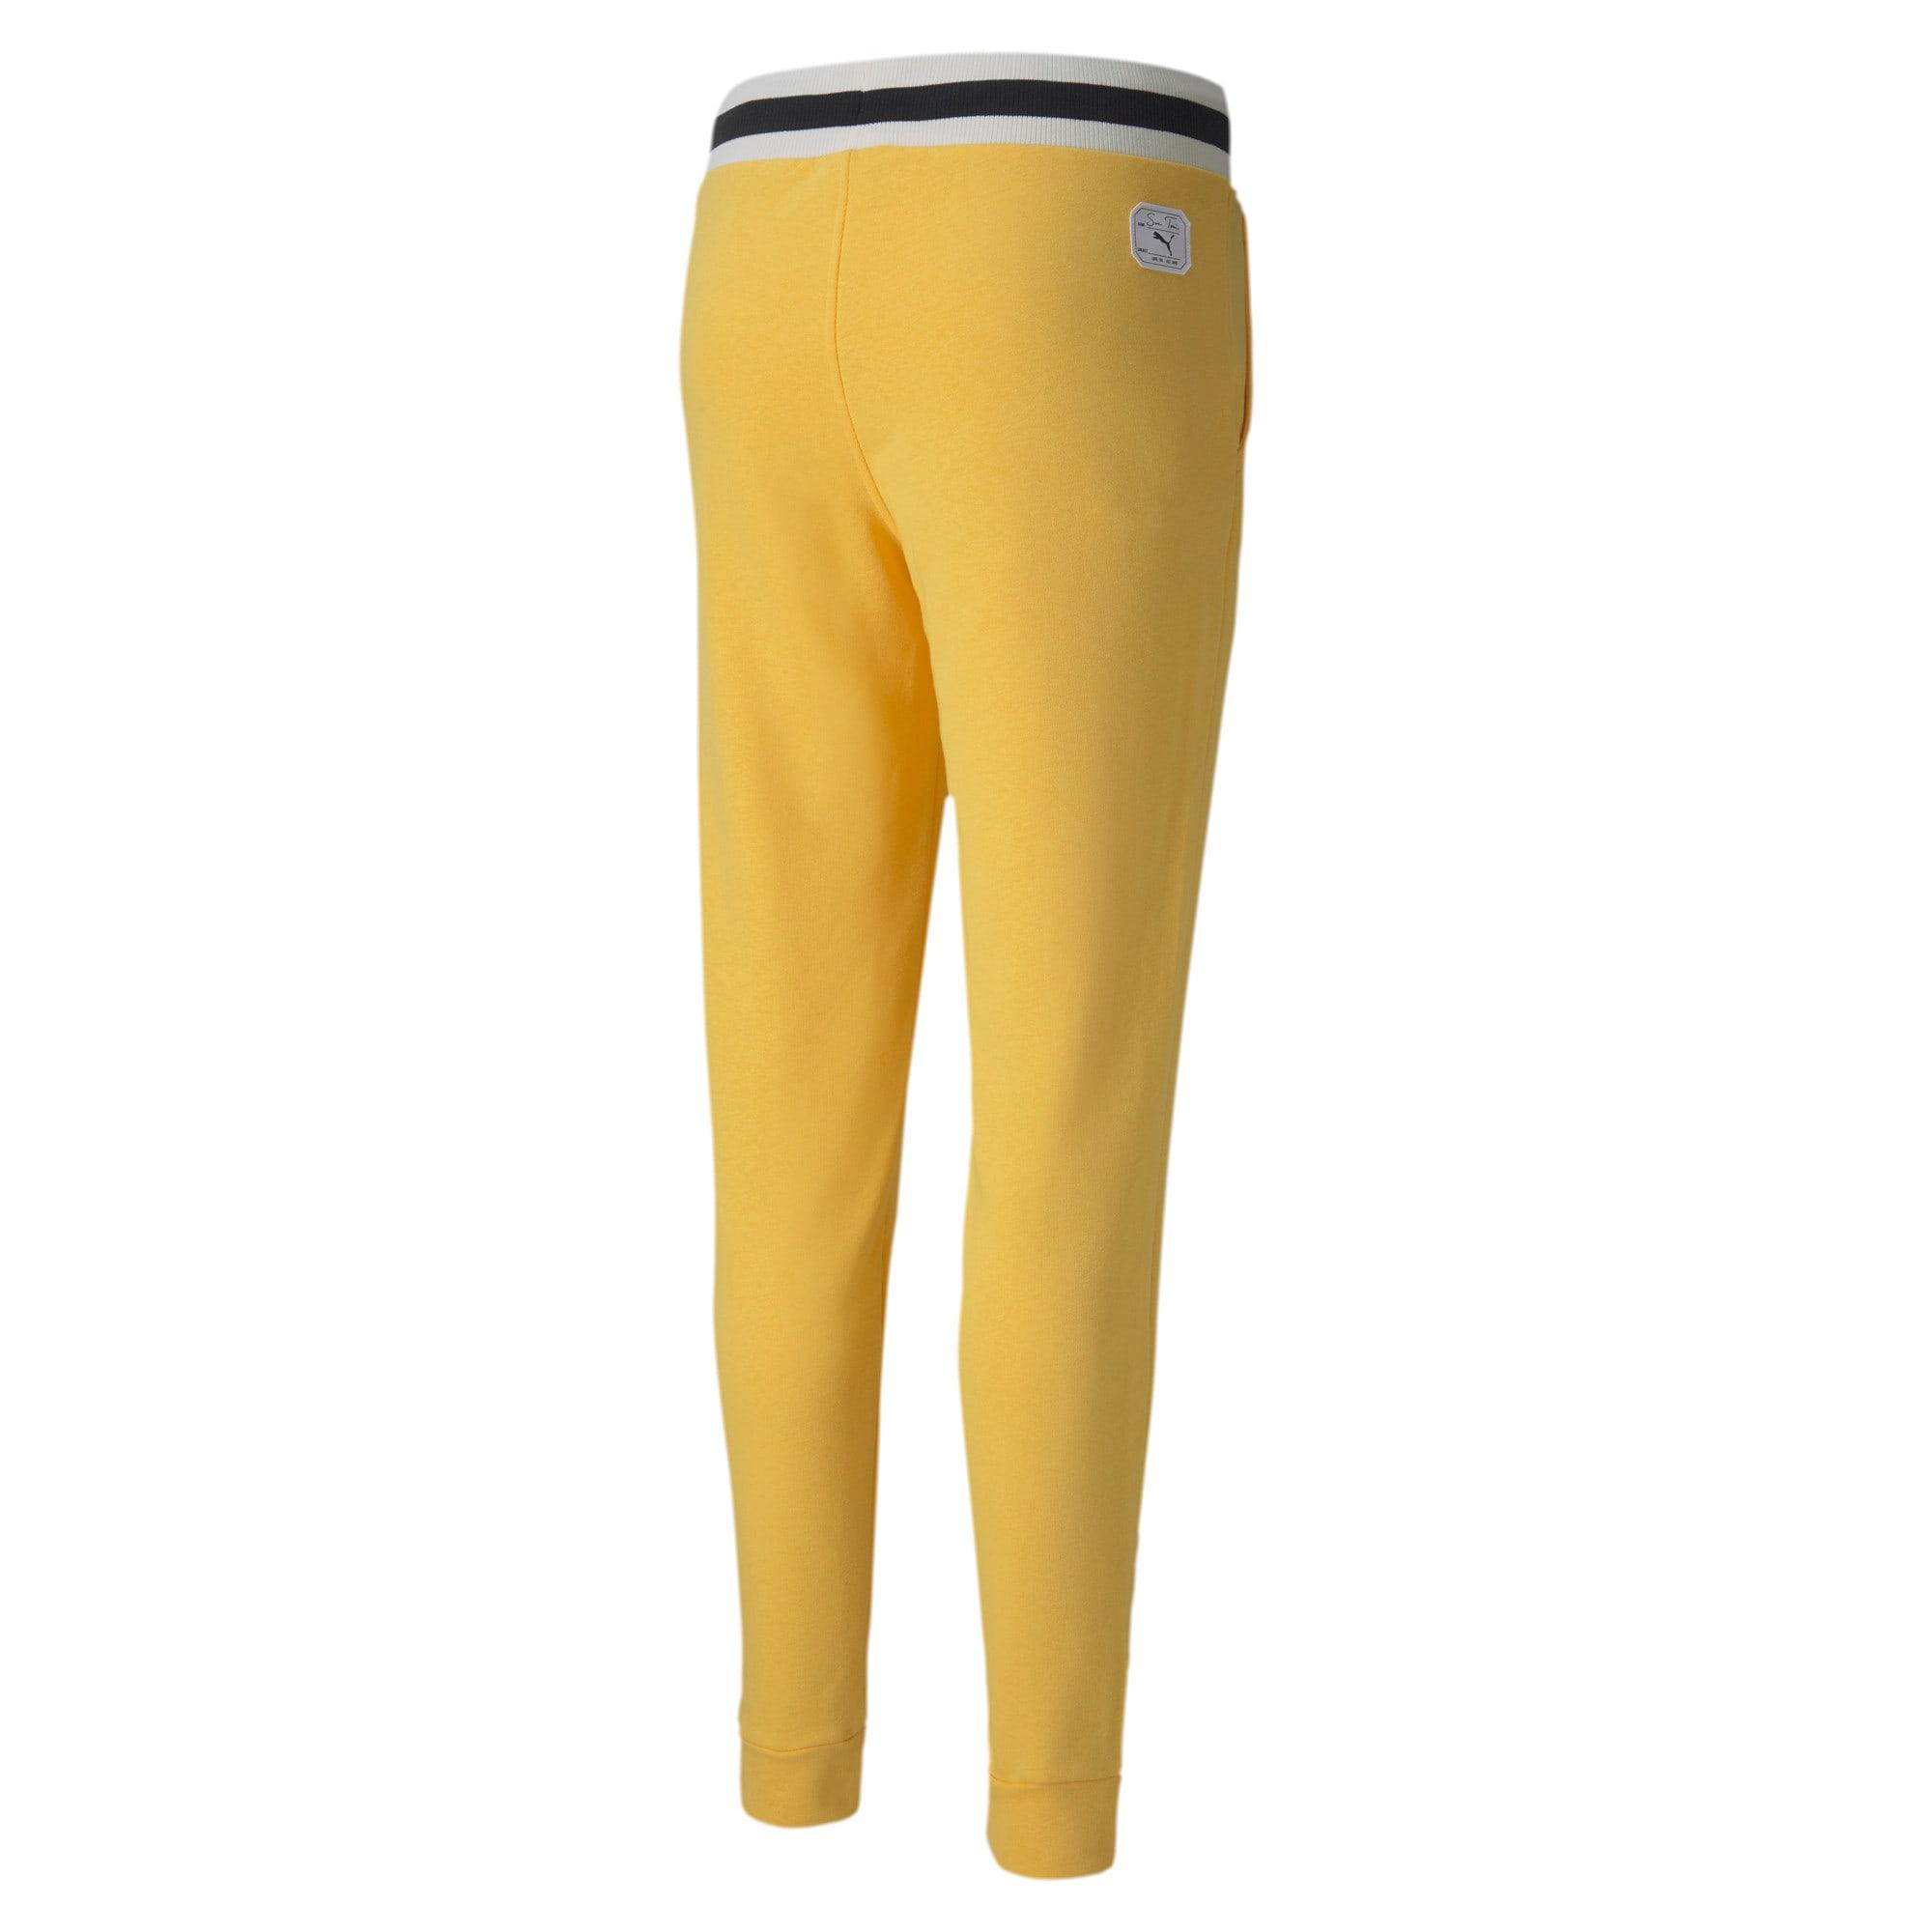 Thumbnail 2 of PUMA x SUE TSAI Damen Sweatpants, Daffodil, medium